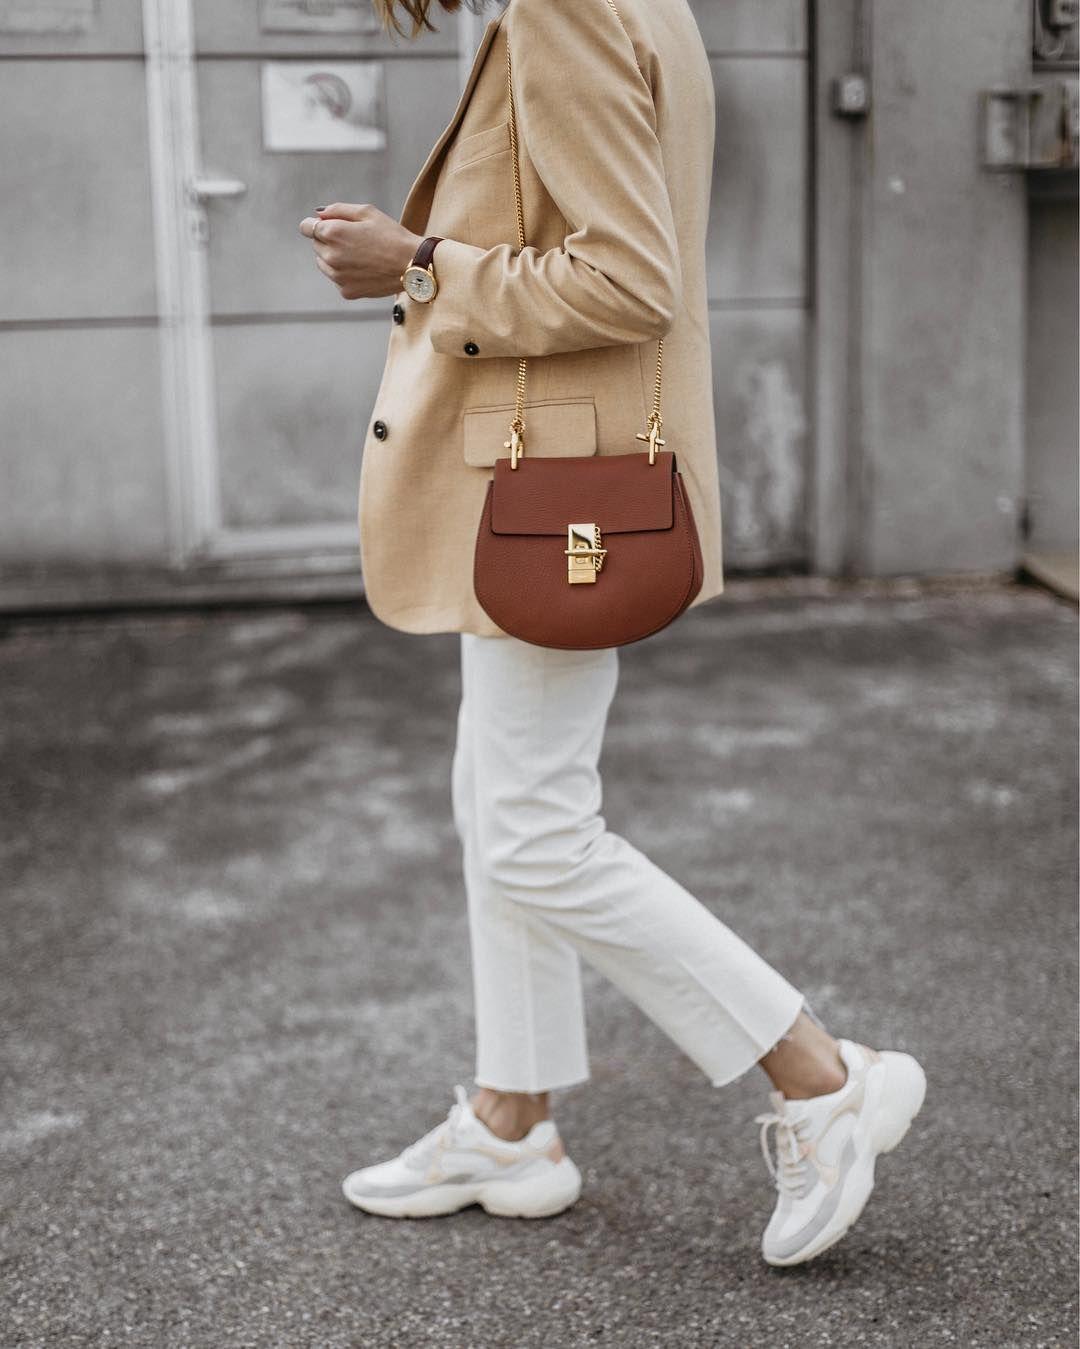 Chloe drew bag, Sneakers outfit casual